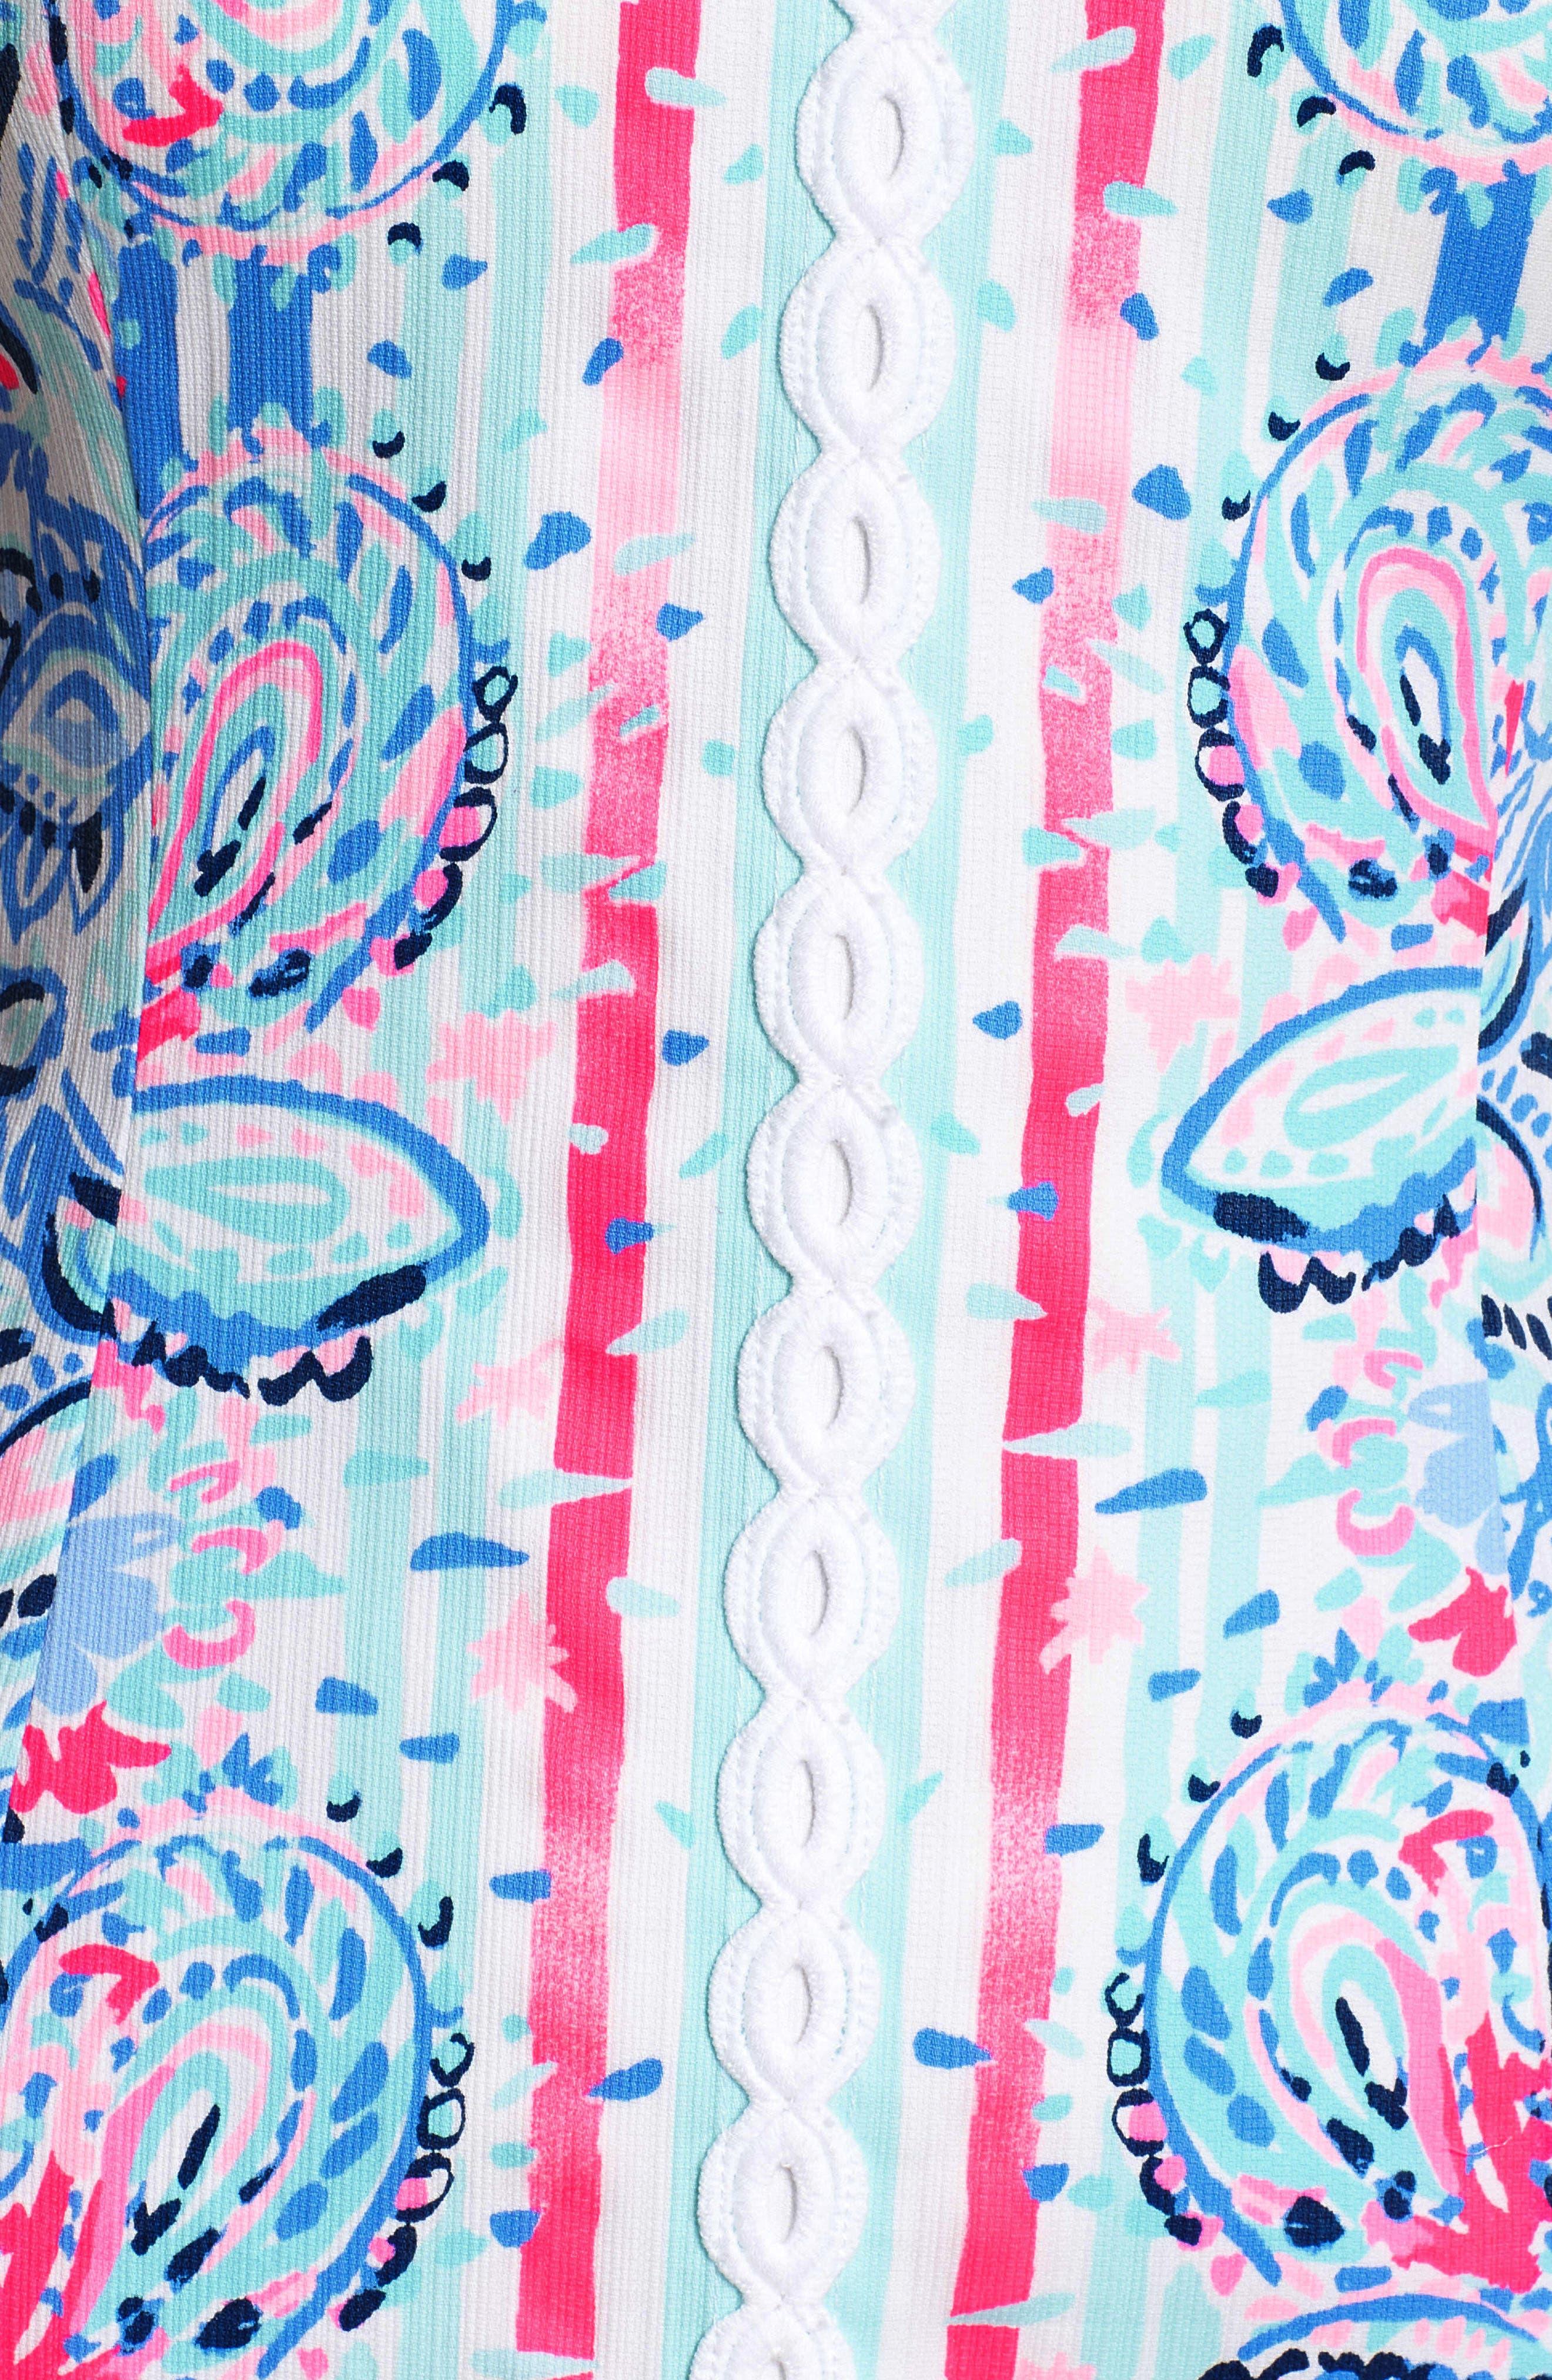 Shelli Stretch Minidress,                             Alternate thumbnail 6, color,                             RESORT WHITE STRIPES AND STR